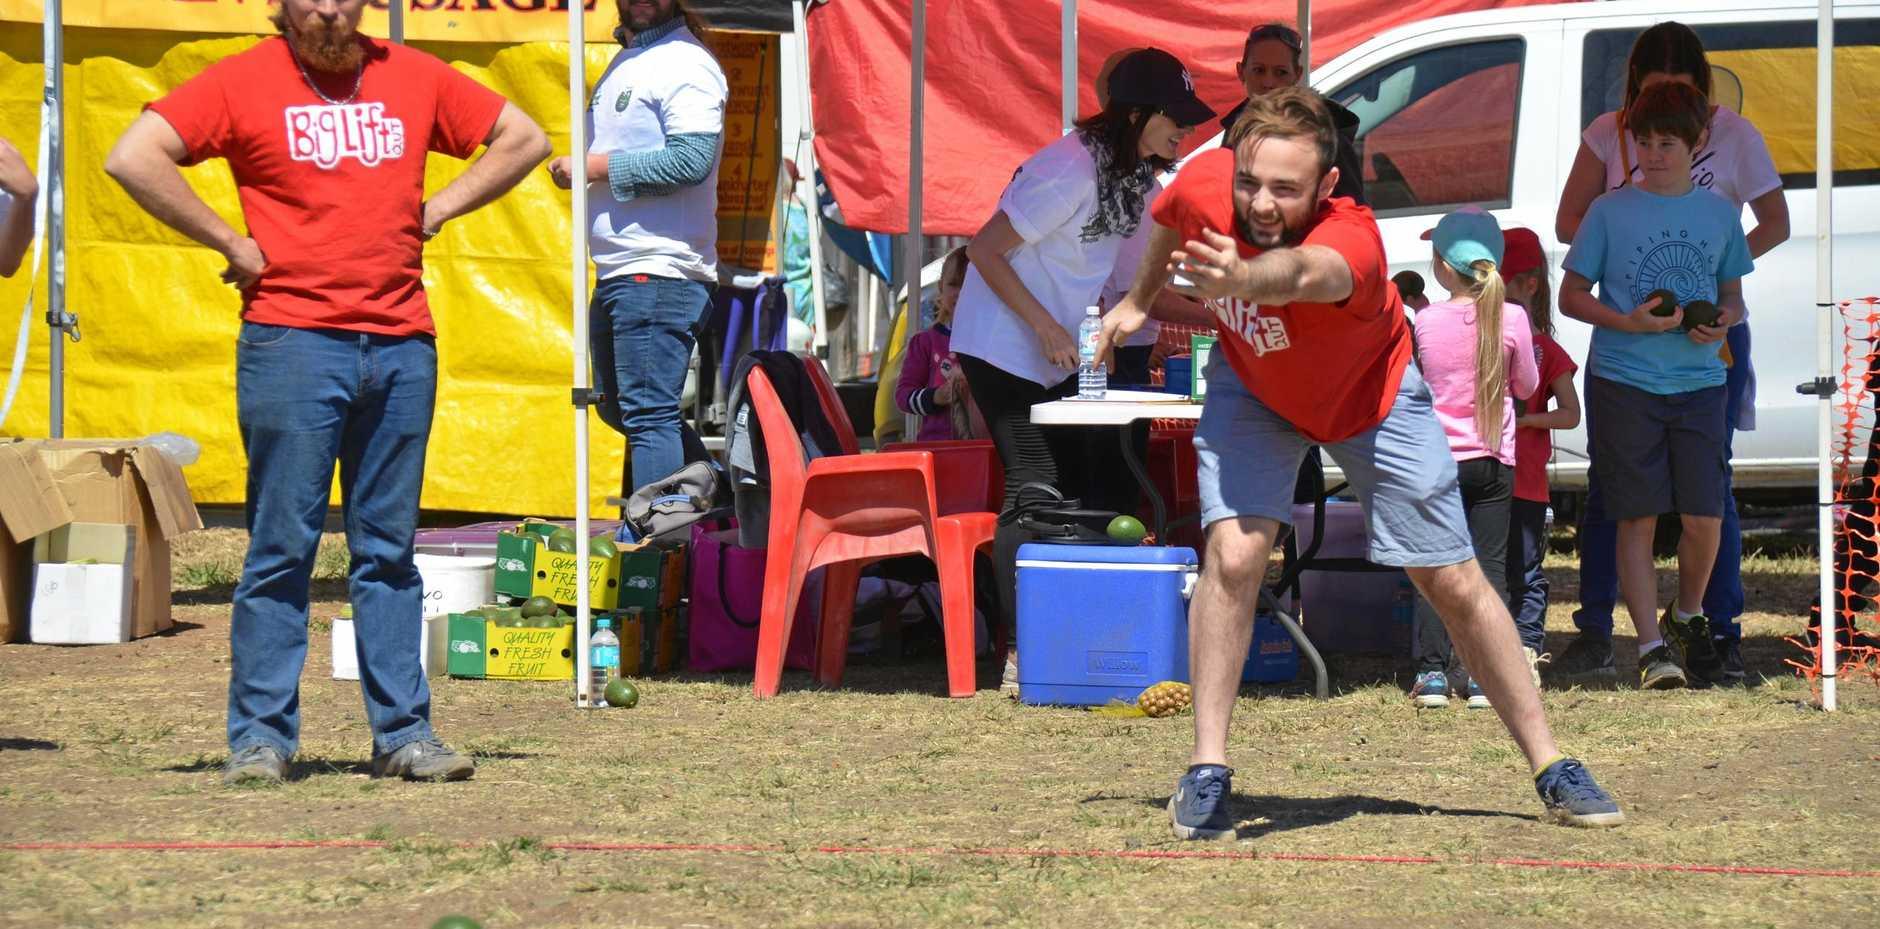 Jacob Dryer from QUT Big Lift rolls down the avocado roll track at the Blackbutt Avocado Festival, September 9 2017.